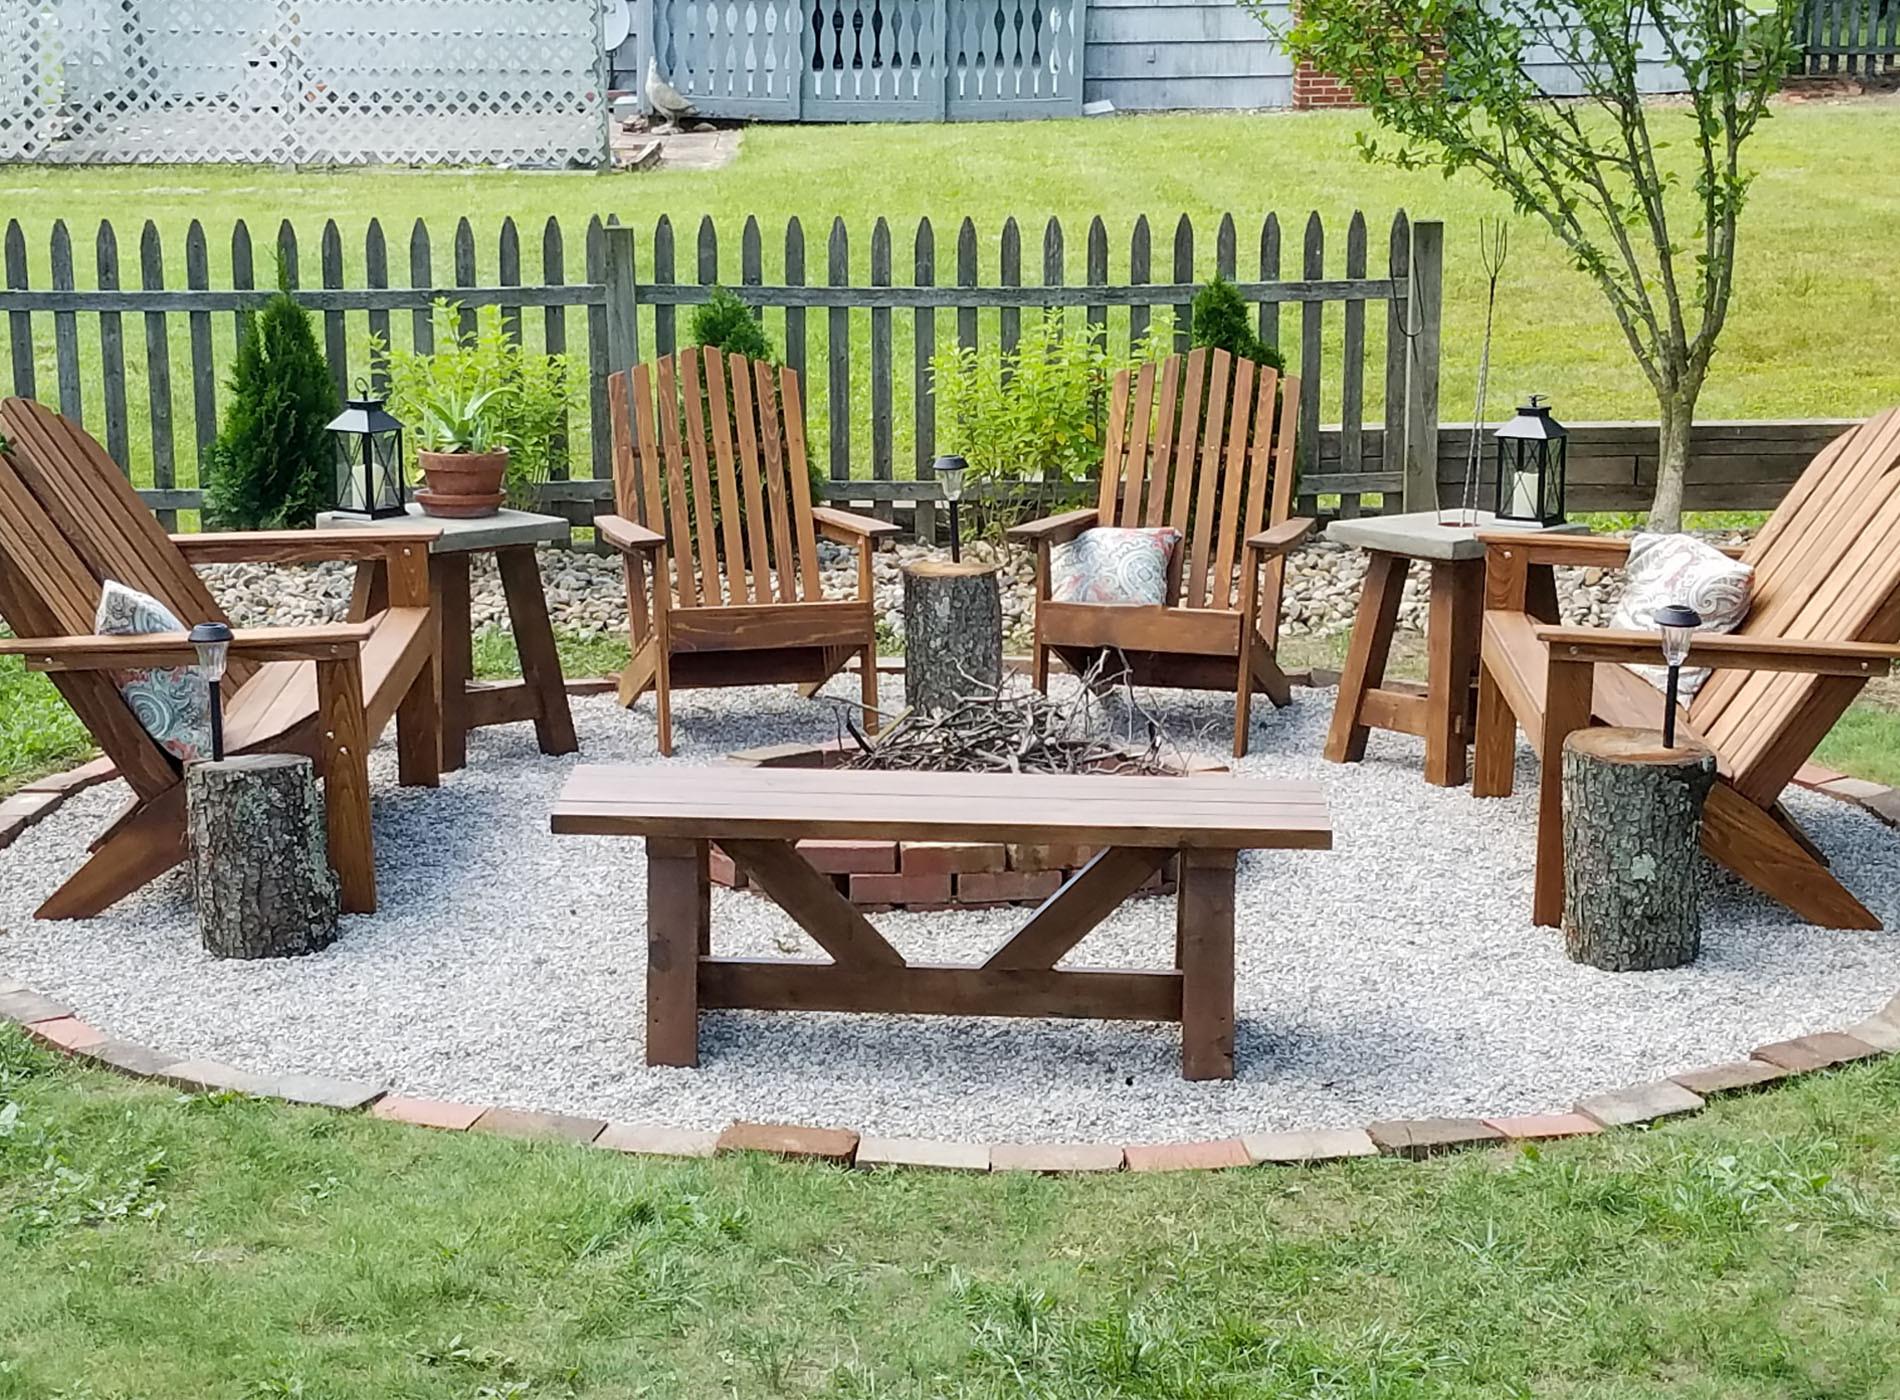 Backyard Fire Pit Ideas Diy  DIY Fire Pit Backyard Bud Decor Prodigal Pieces